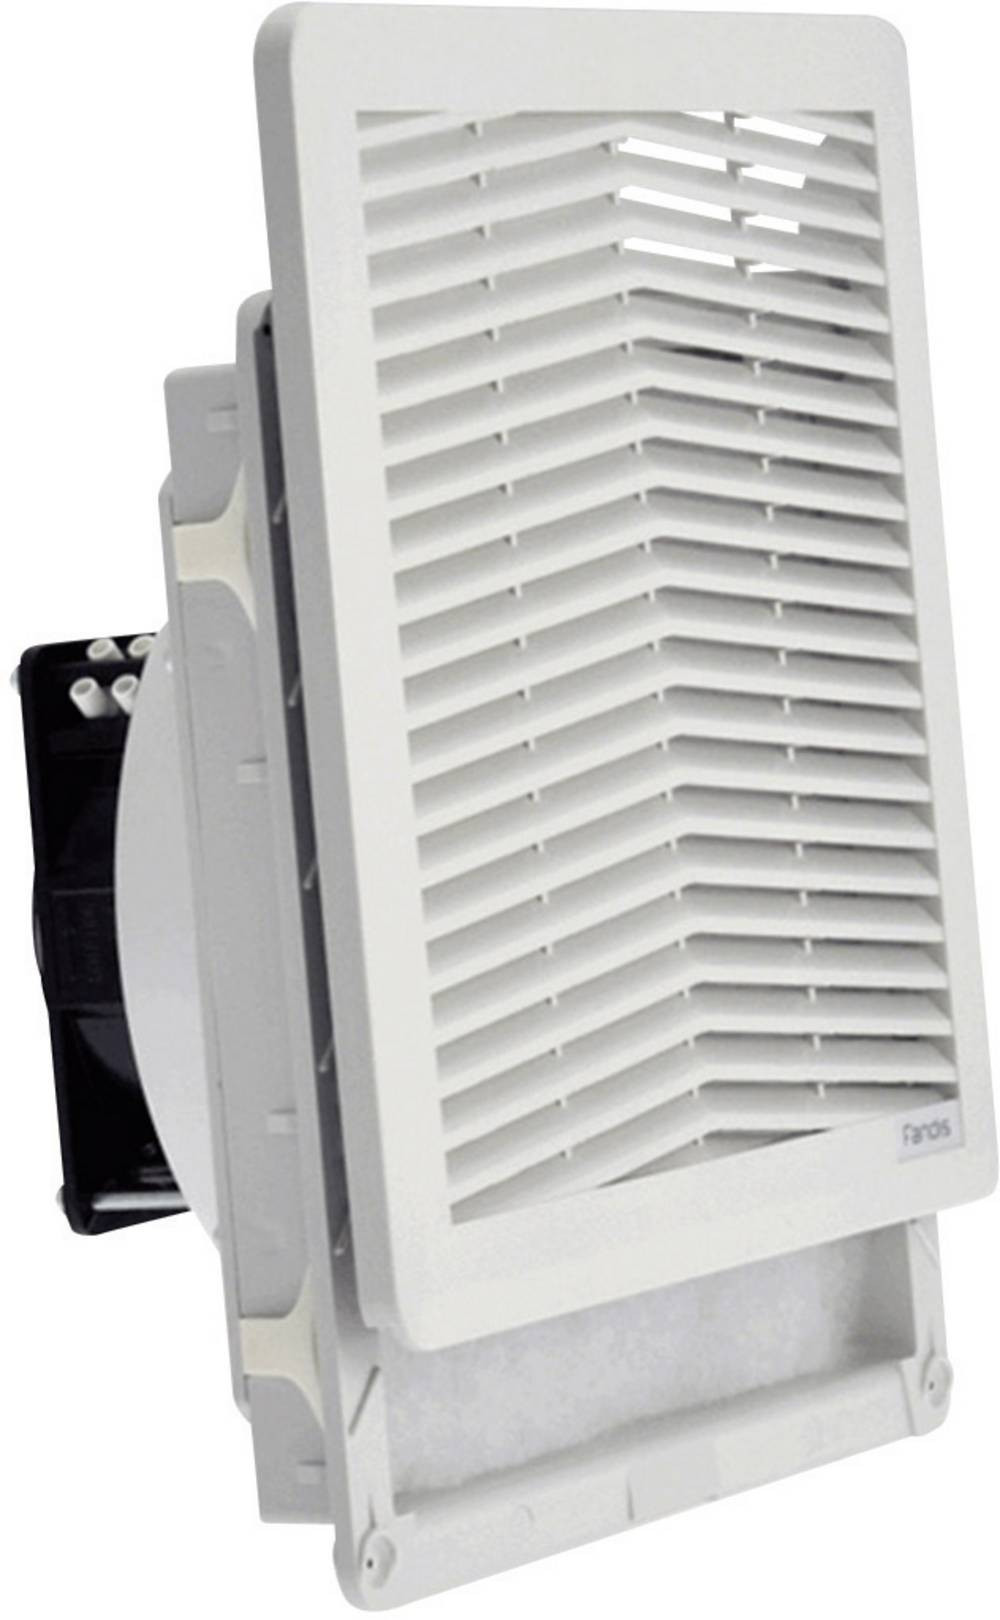 FF15PA230UF Fandis 230 V/AC 18 W (B x H x T) 250 x 250 x 102.9 mm